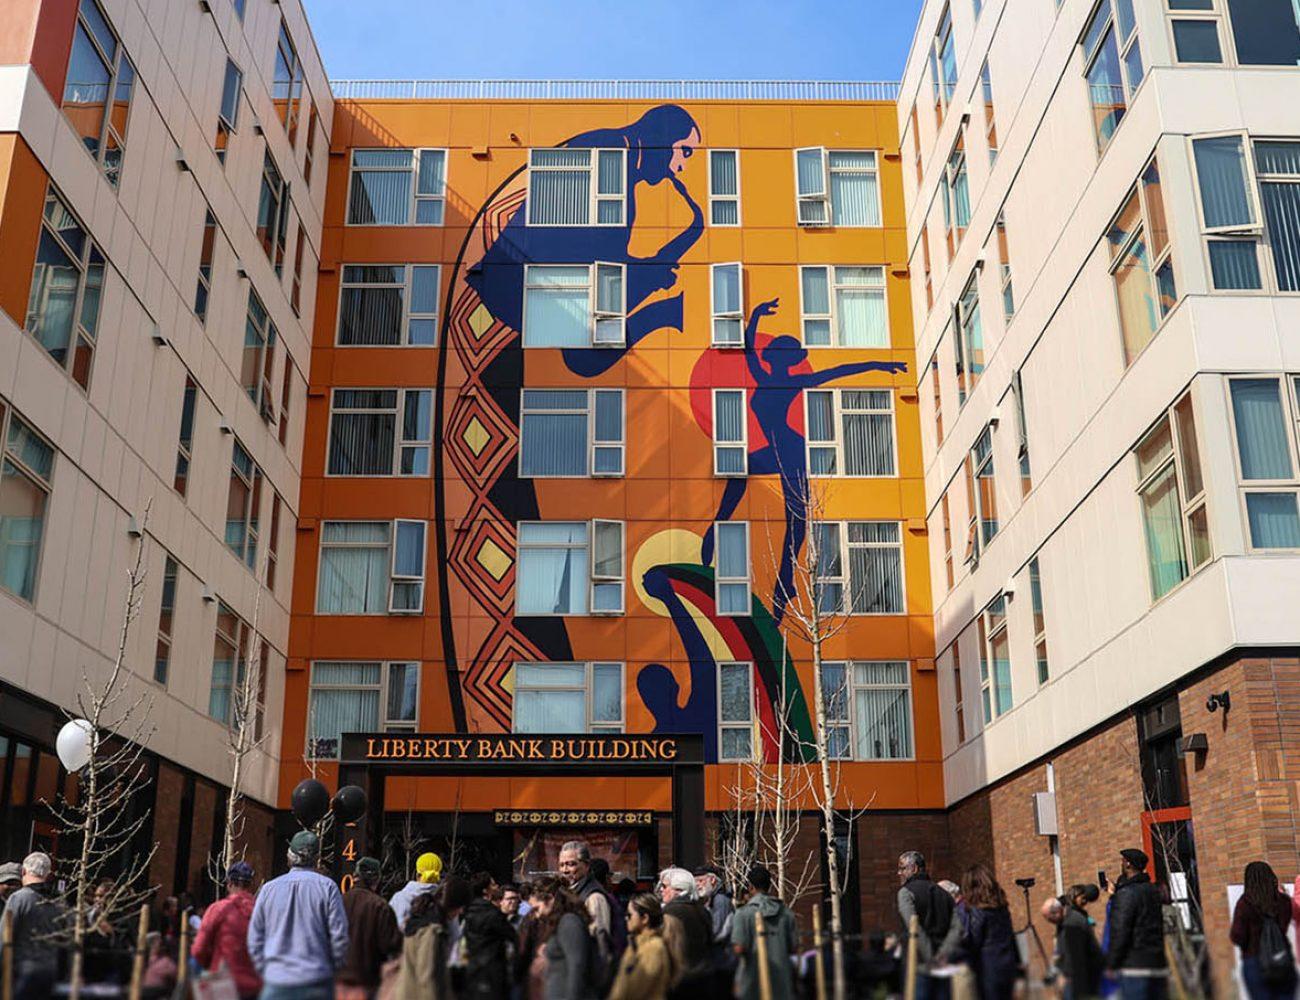 aclt-slide-liberty-bank-building.jpg